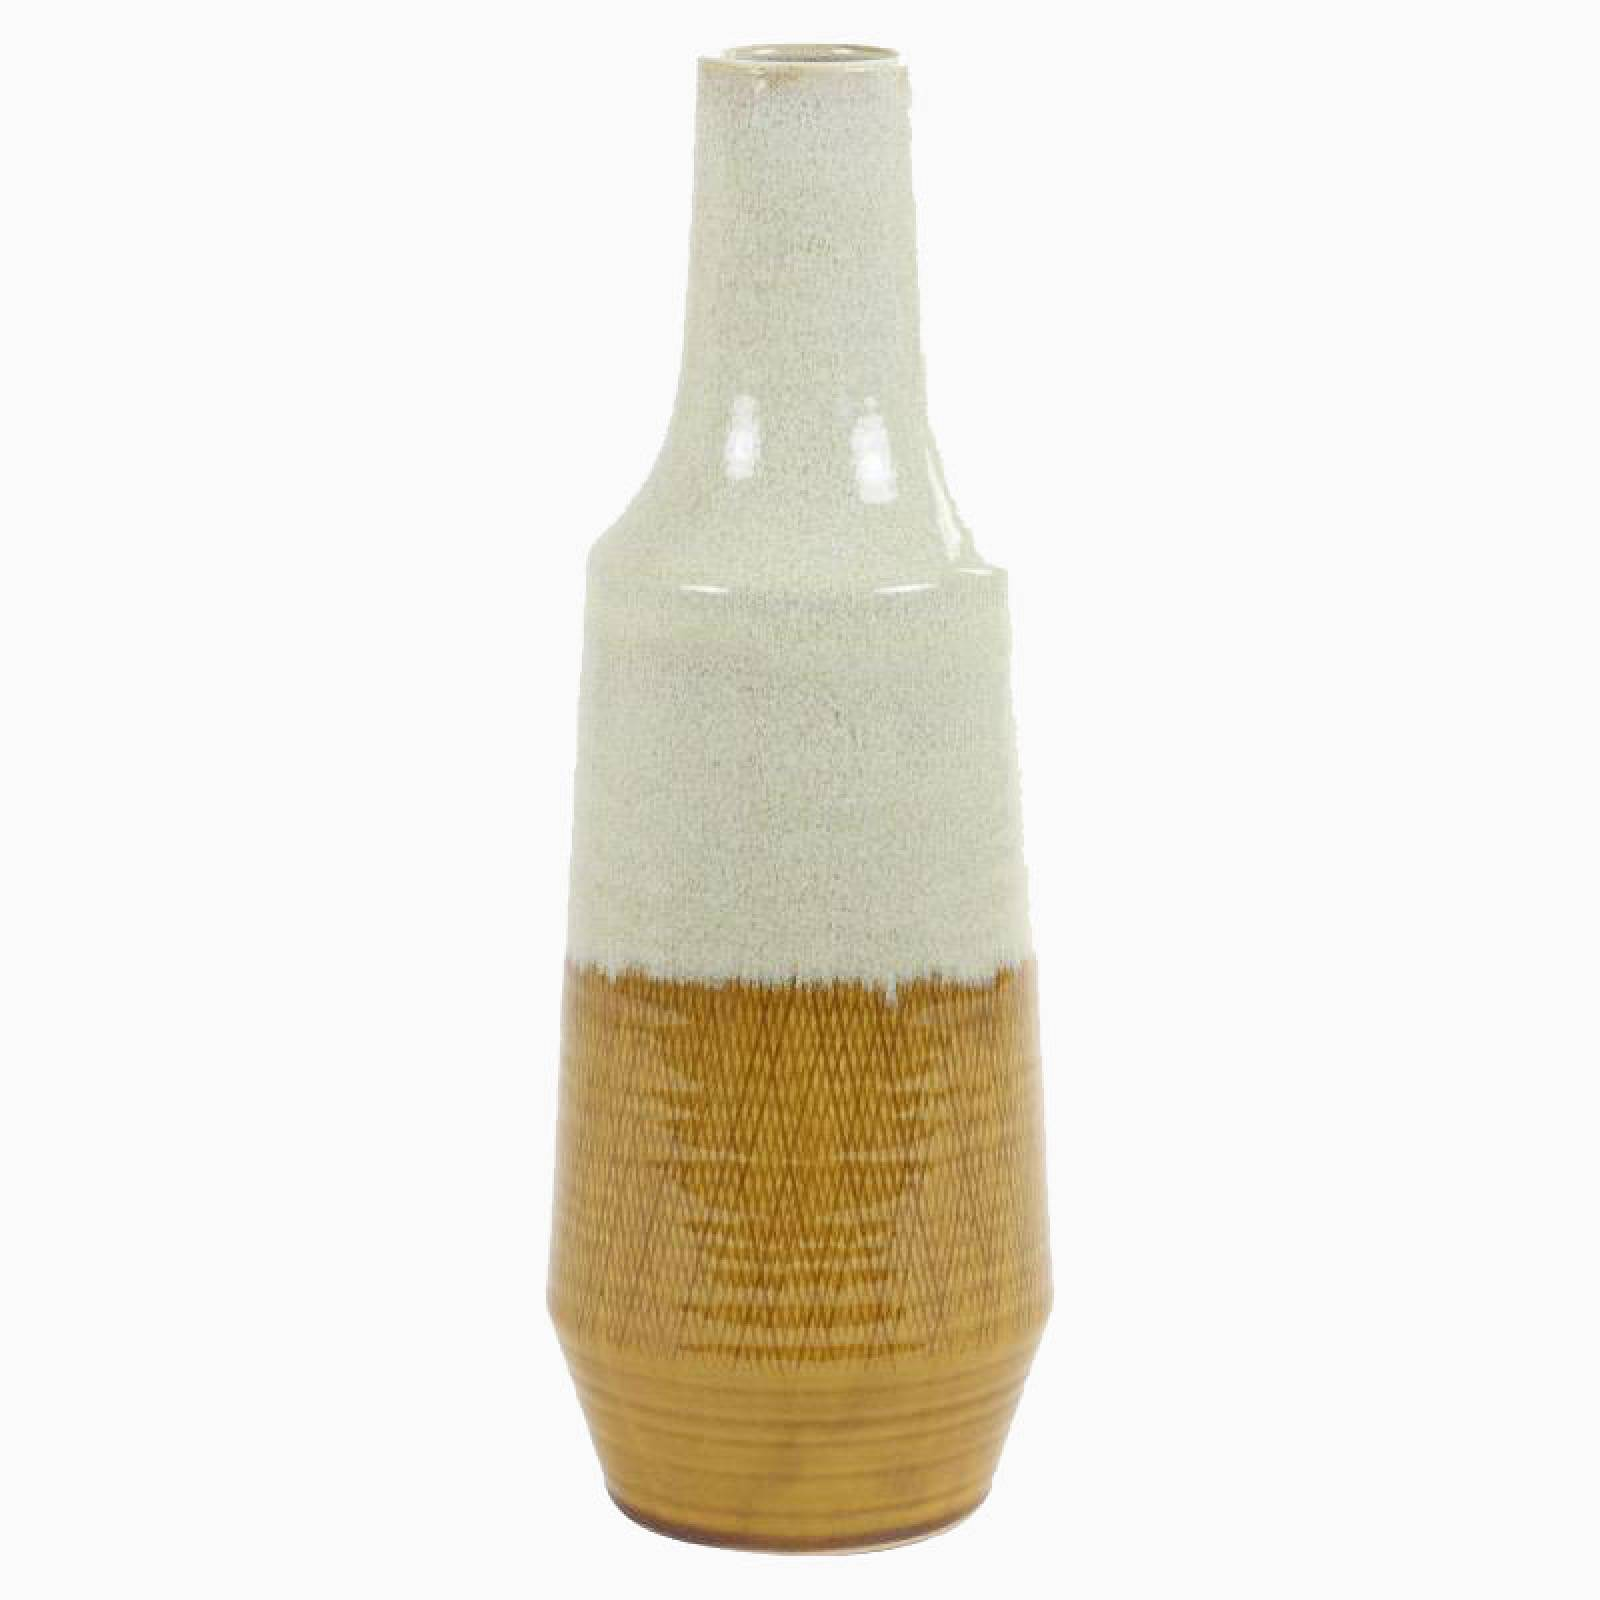 Large Mid-Century Style Cream And Ochre Vase